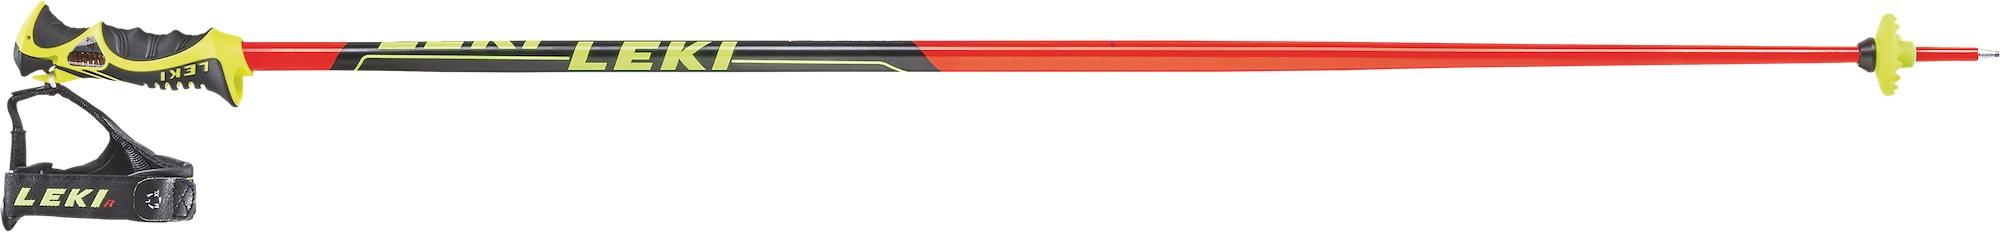 Leki - Worldcup Racing SL - Ski poles